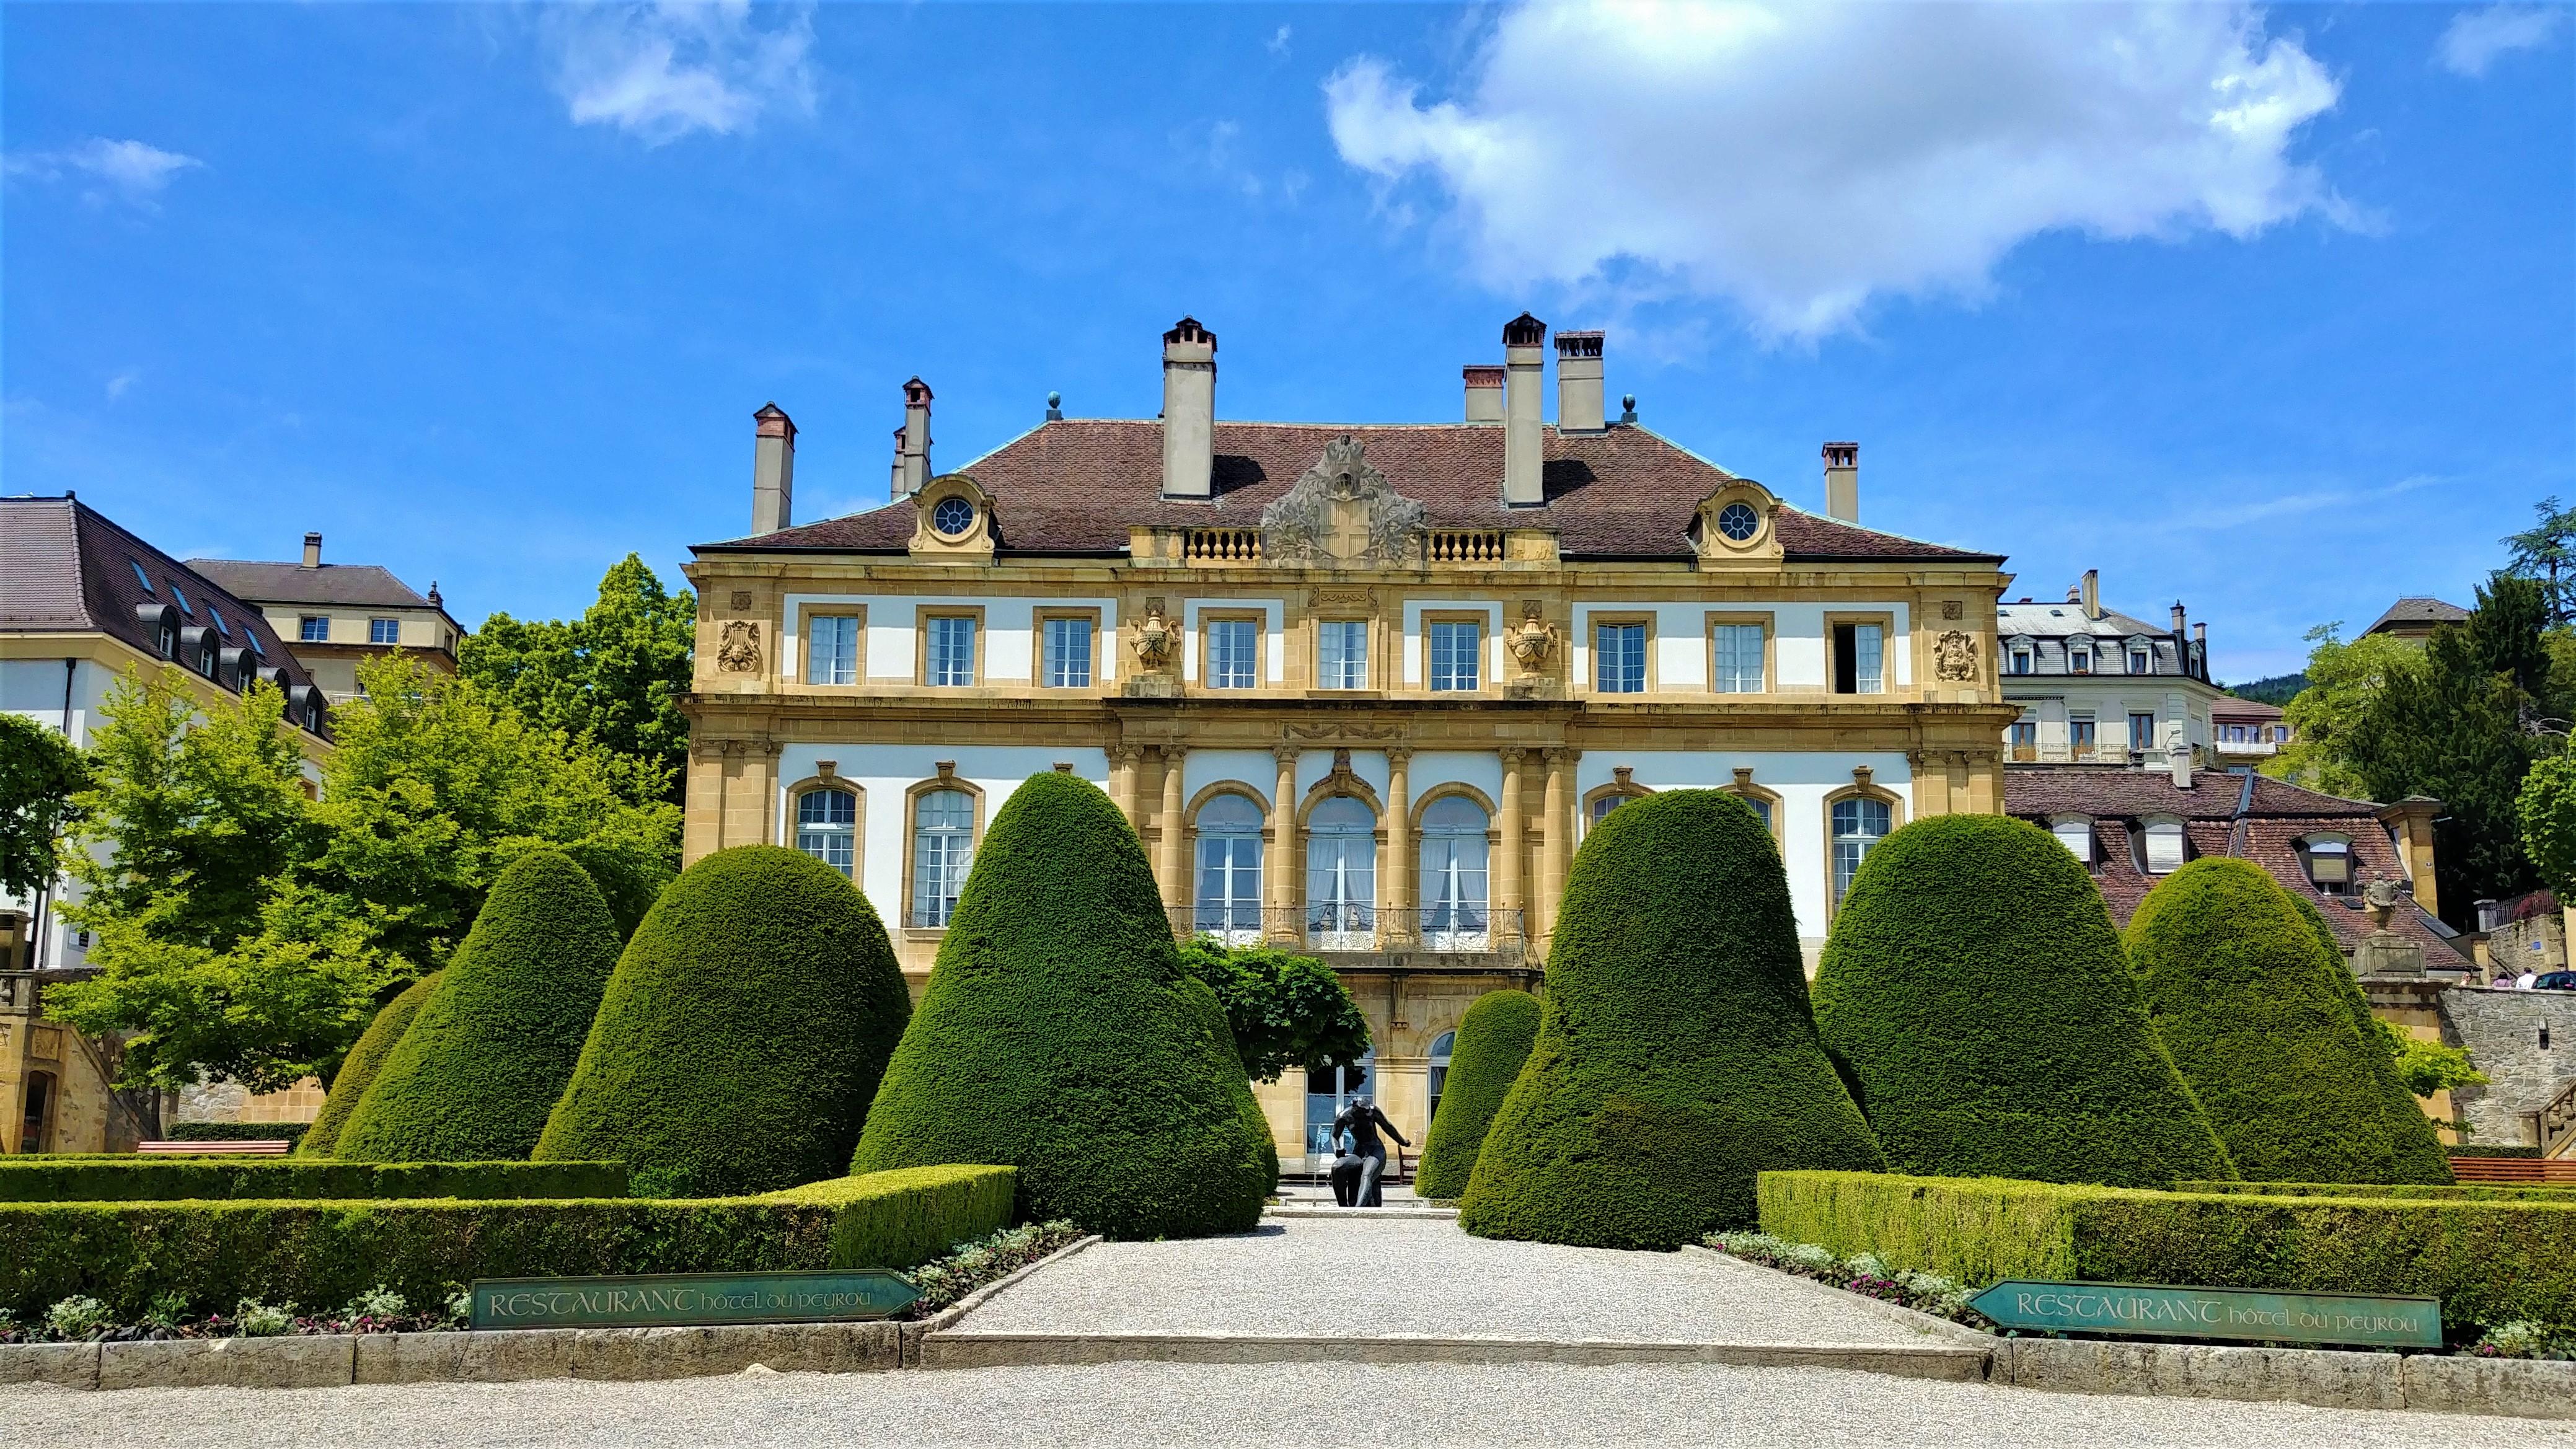 neuchatel visiter blog voyage suisse